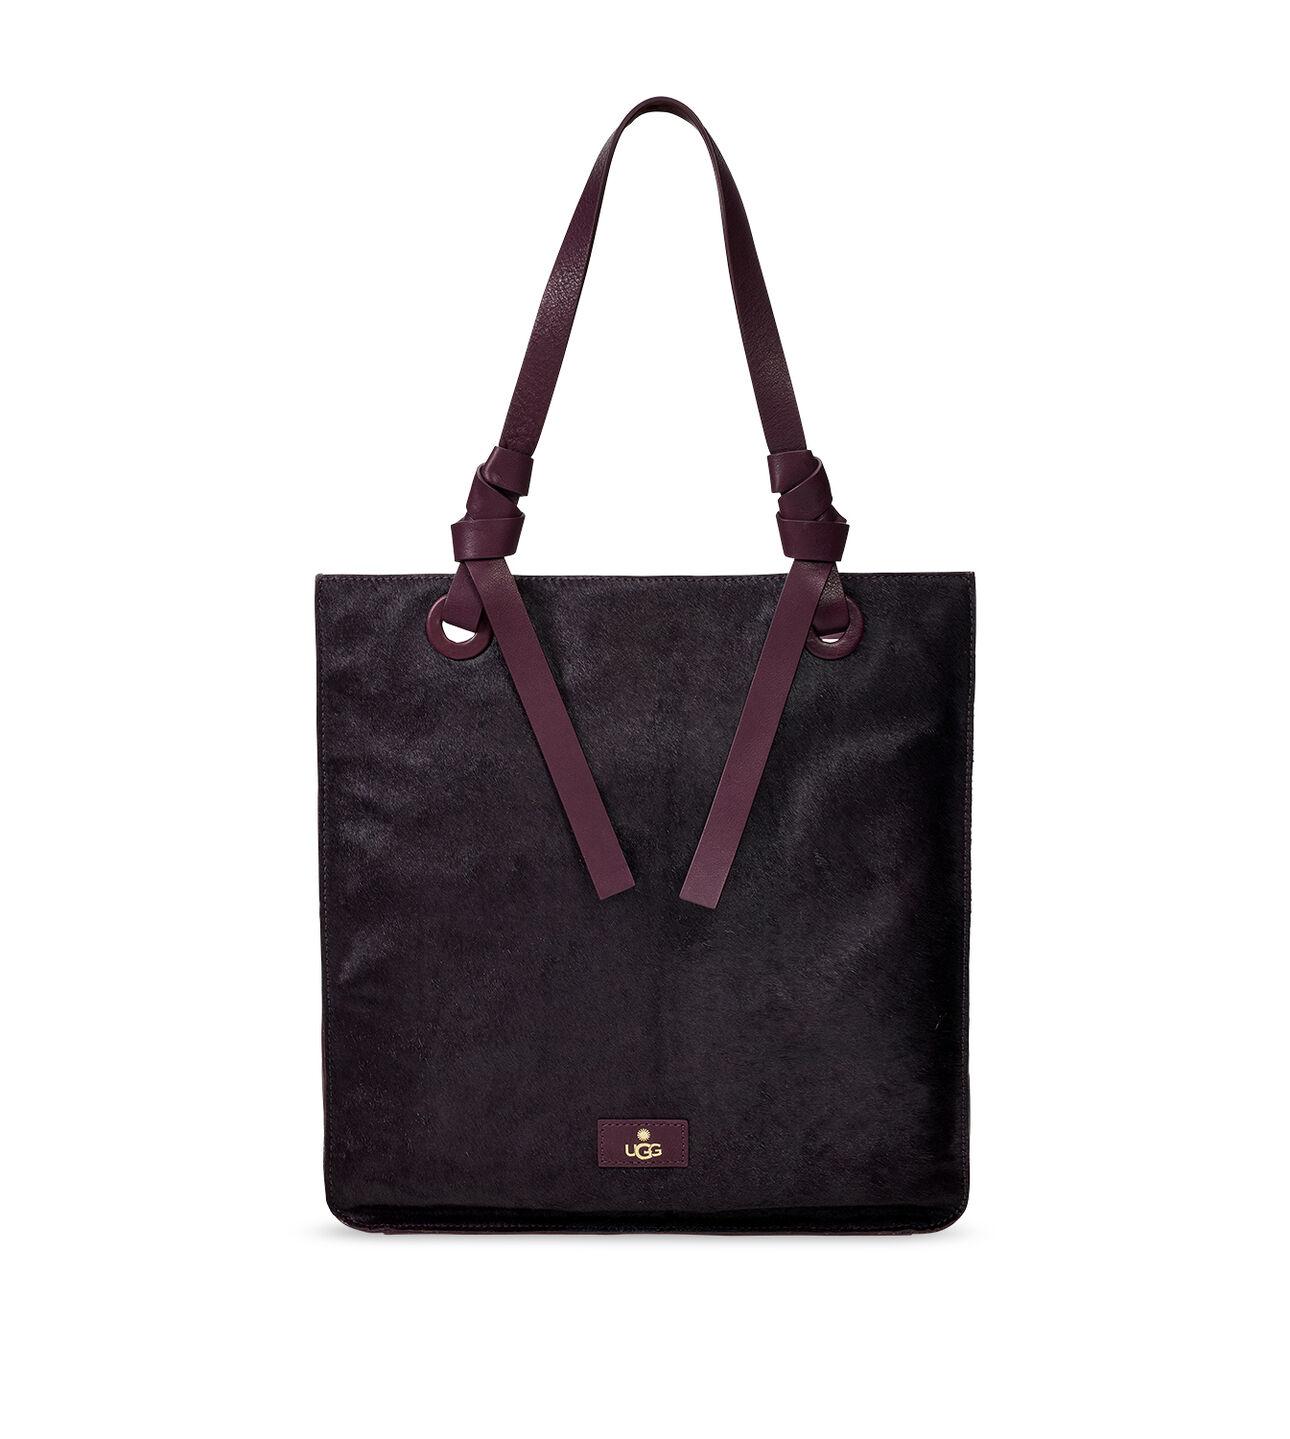 new ugg handbags